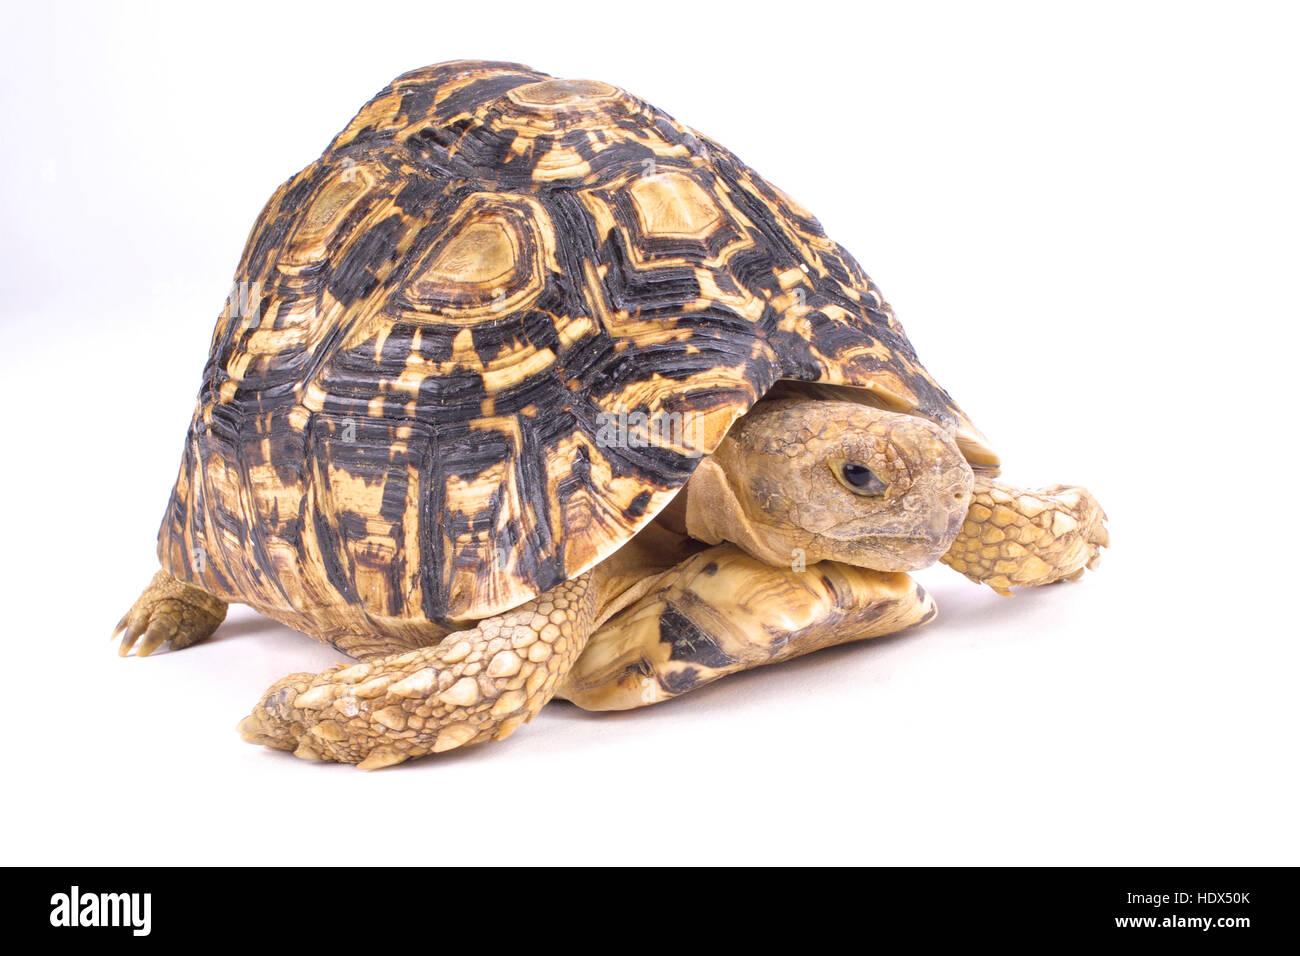 Leopard tortoise, Geochelone pardalis - Stock Image